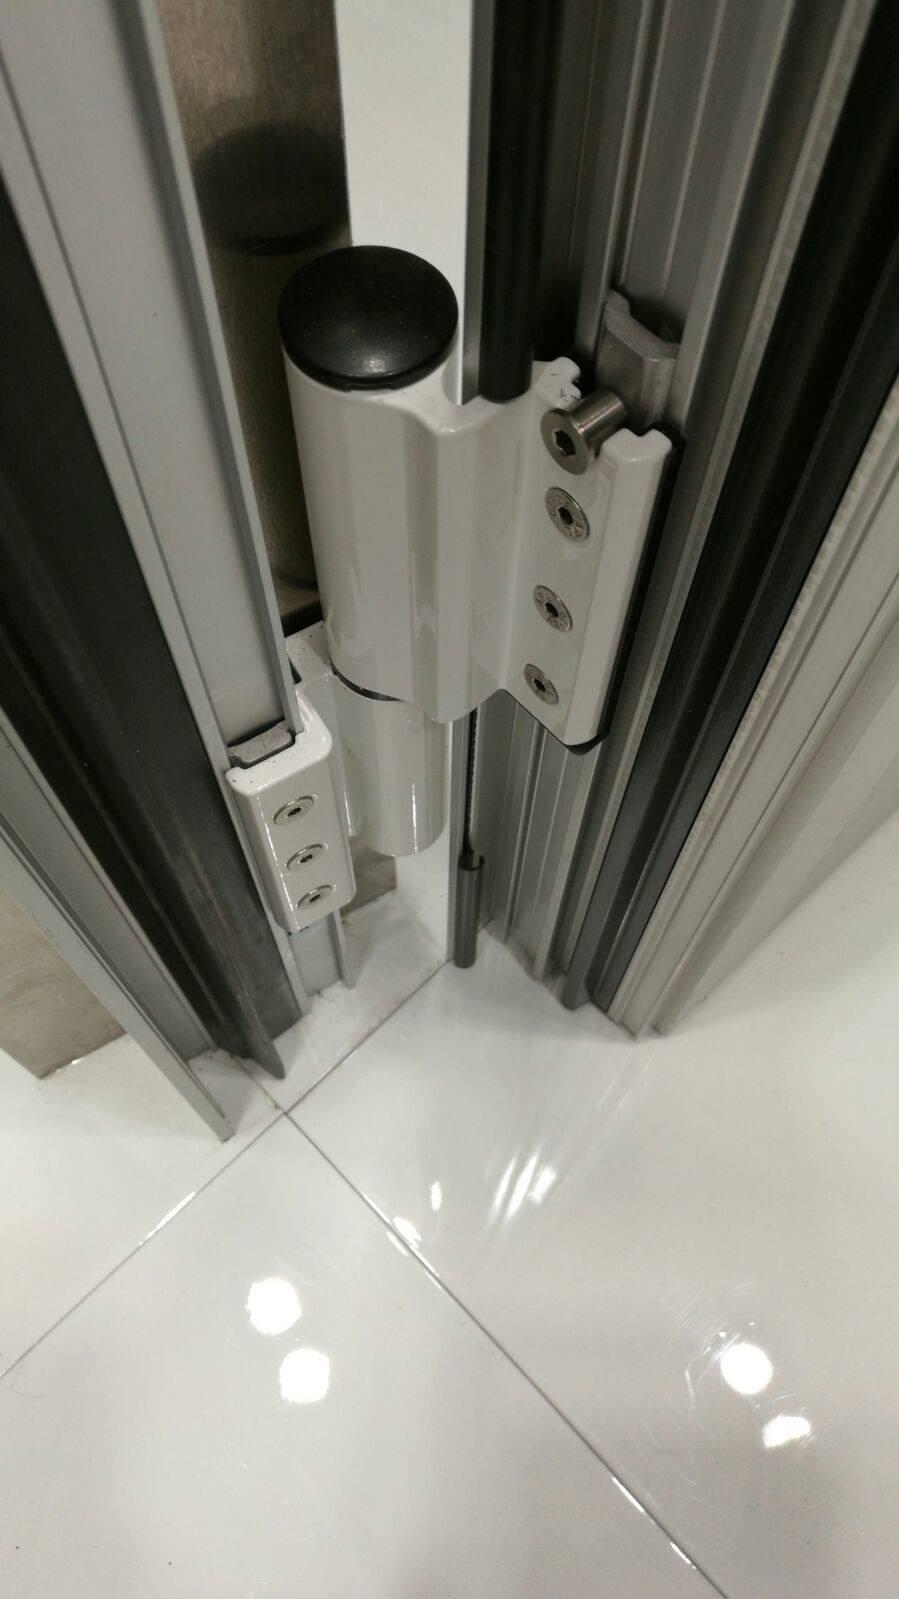 Savio hinge with integrated door closer Reklò & Savio Reklò Innovative Door Closing Hinge Buy Online | Windowo